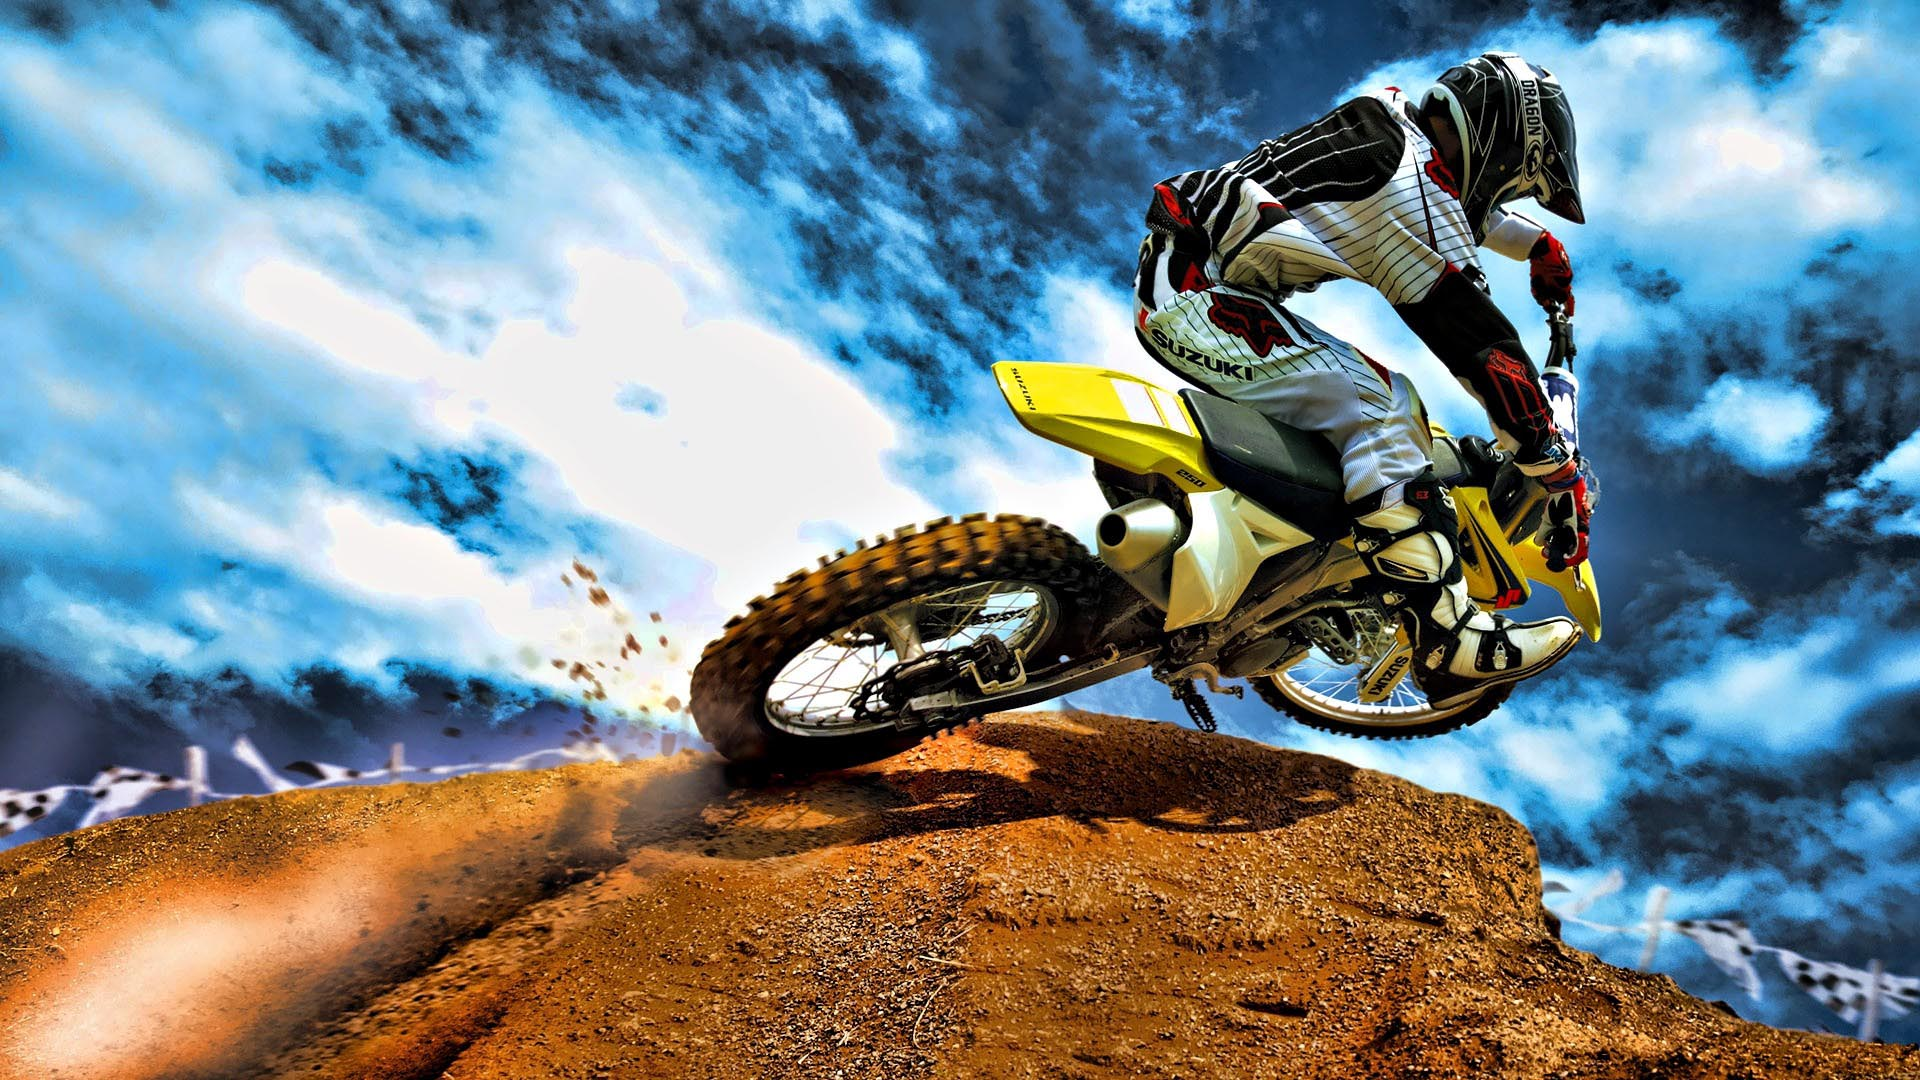 Motocross wallpaper   559613 1920x1080